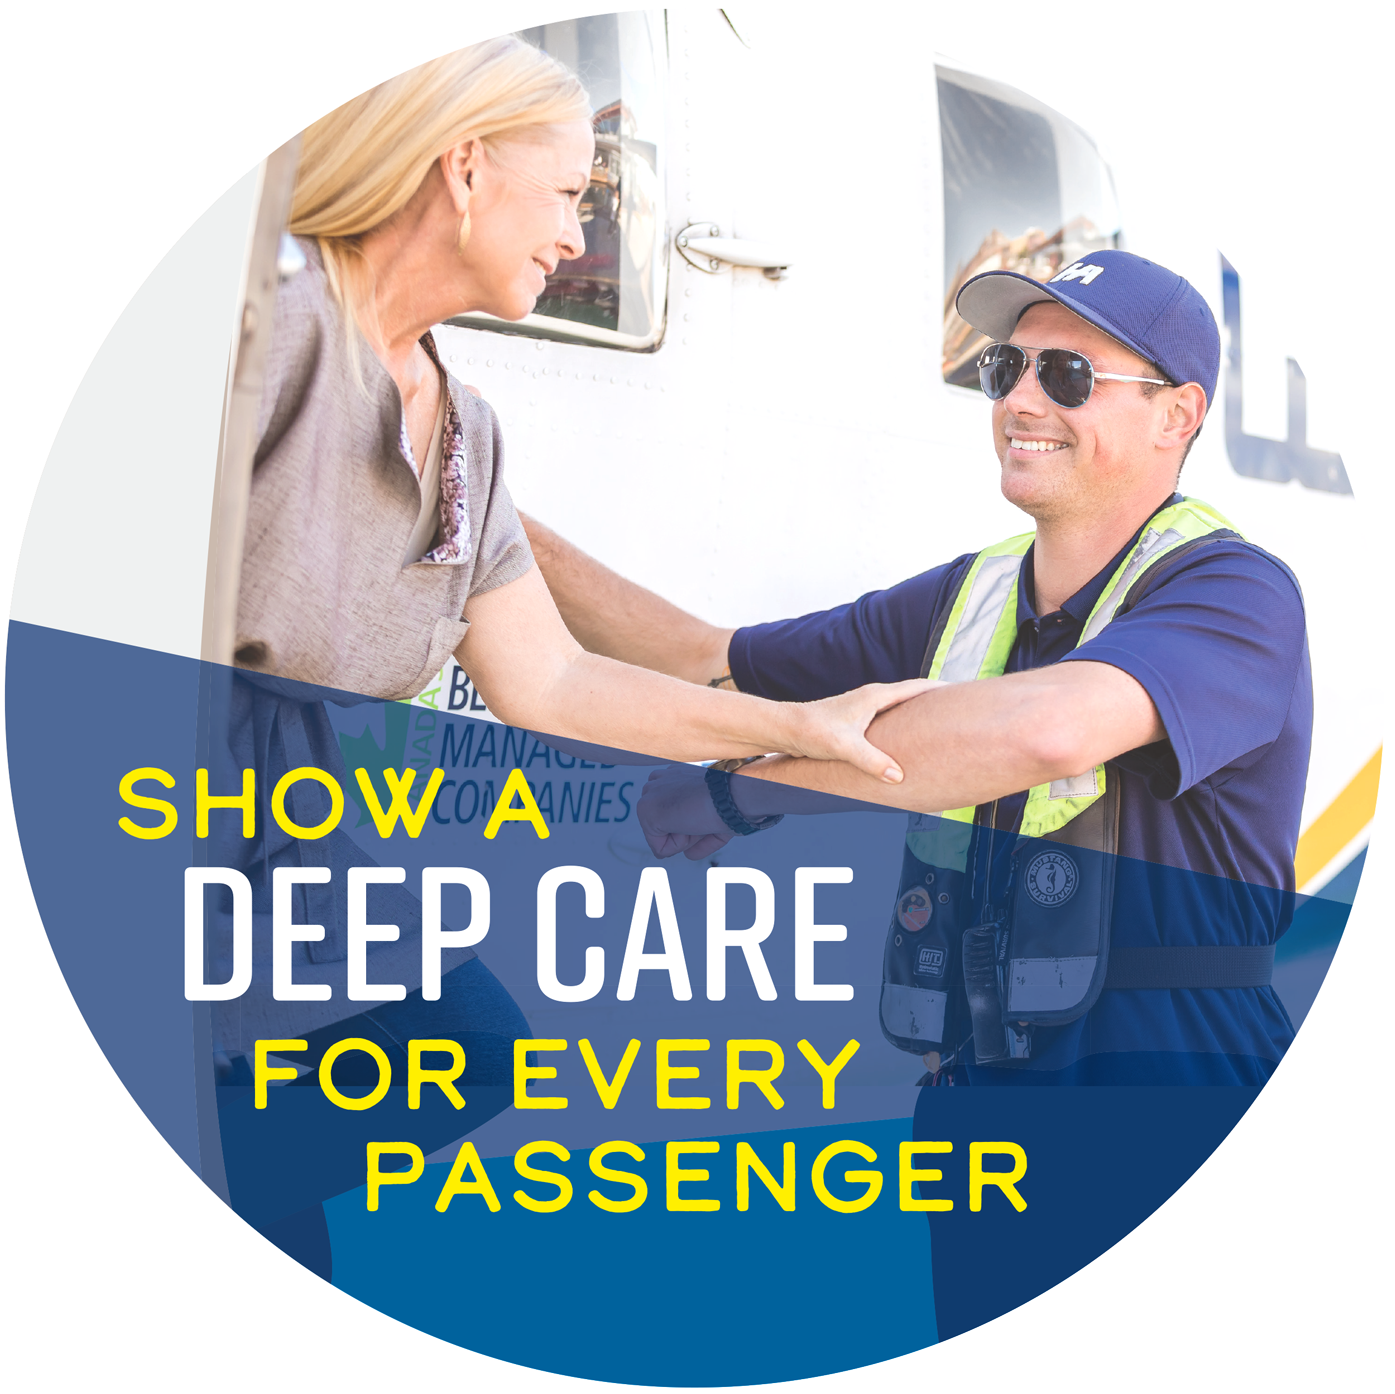 Show a deep care for every passenger